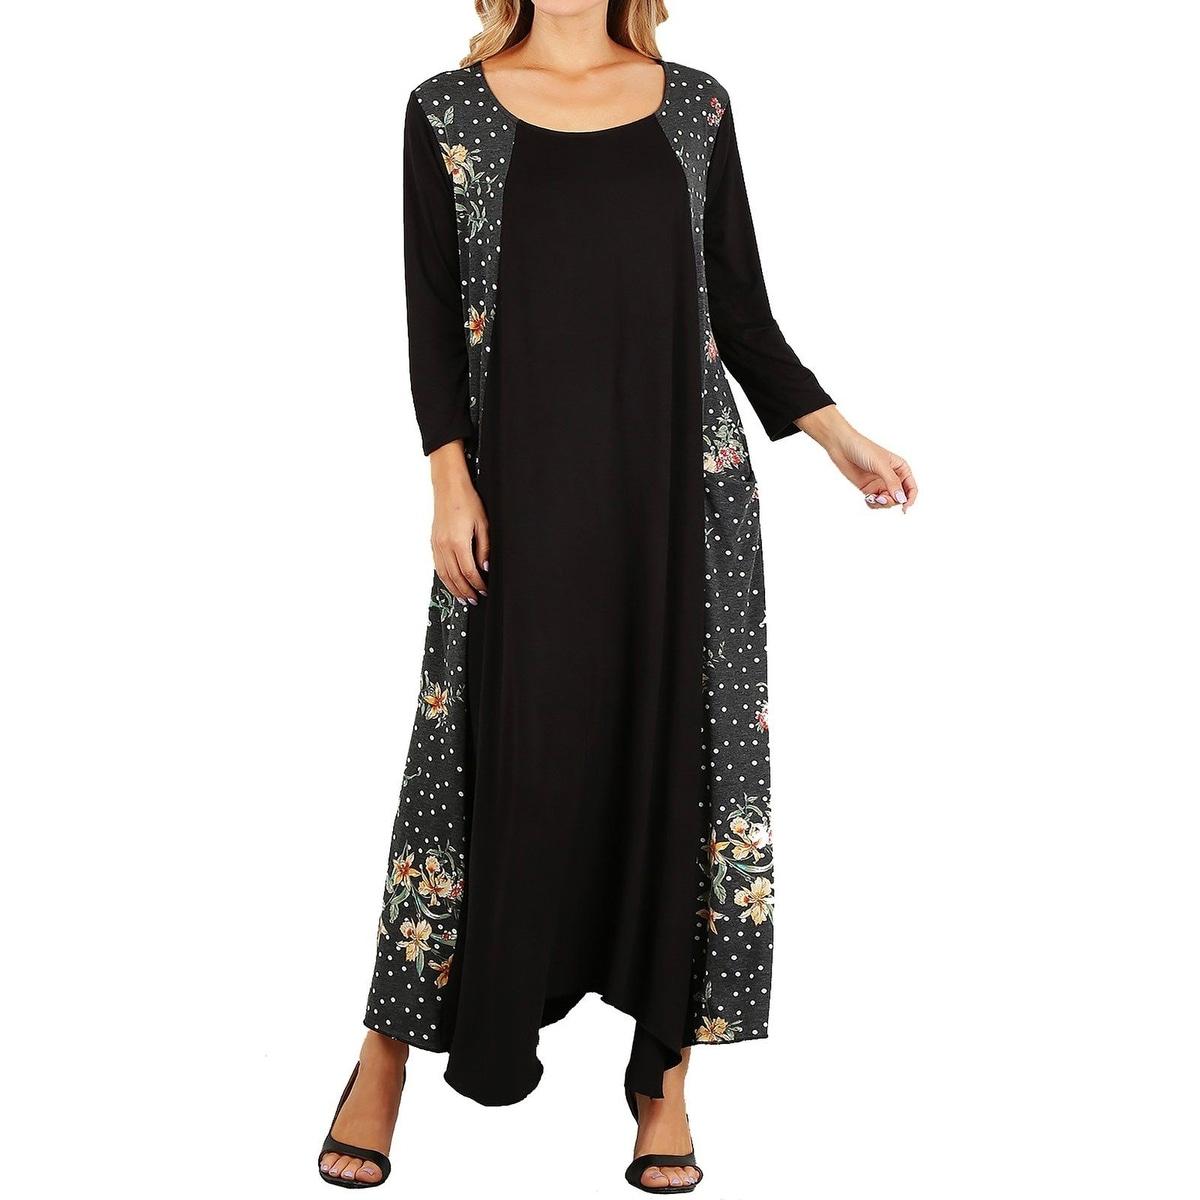 Funfash Plus Size Women Black White Peach Long Sleeves Maxi Dress USA